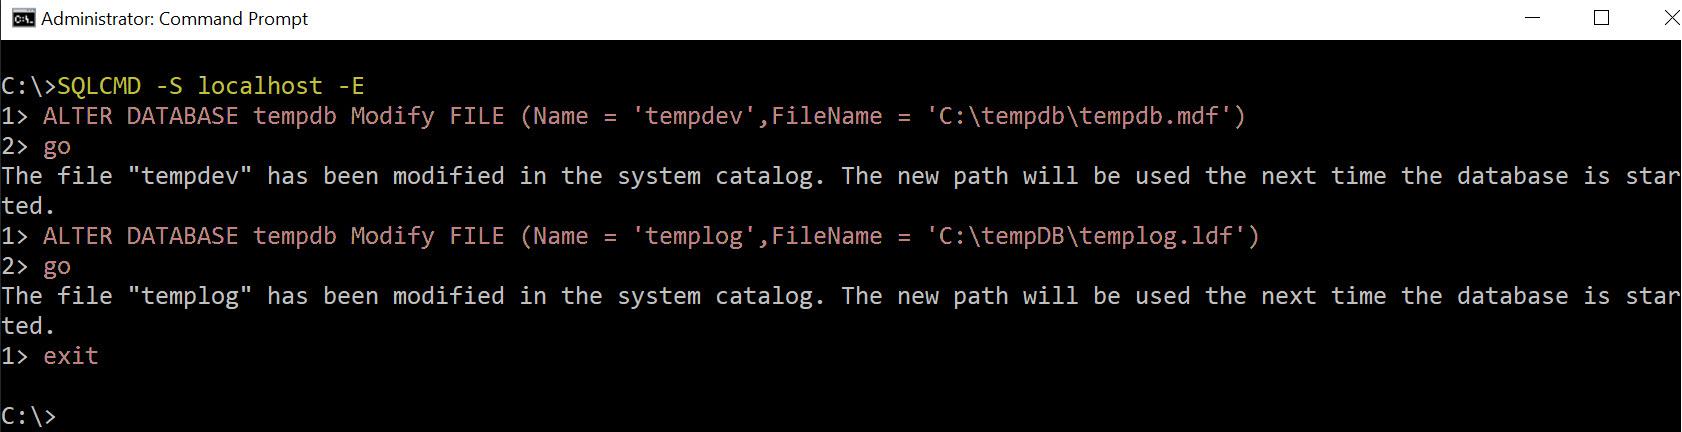 "SQL SERVER - FCB::Open Failed - TEMPDB Files Fail to be Created with Error: ""CREATE FILE Encountered Operating System Error 3"" temp-os-err-3-2"